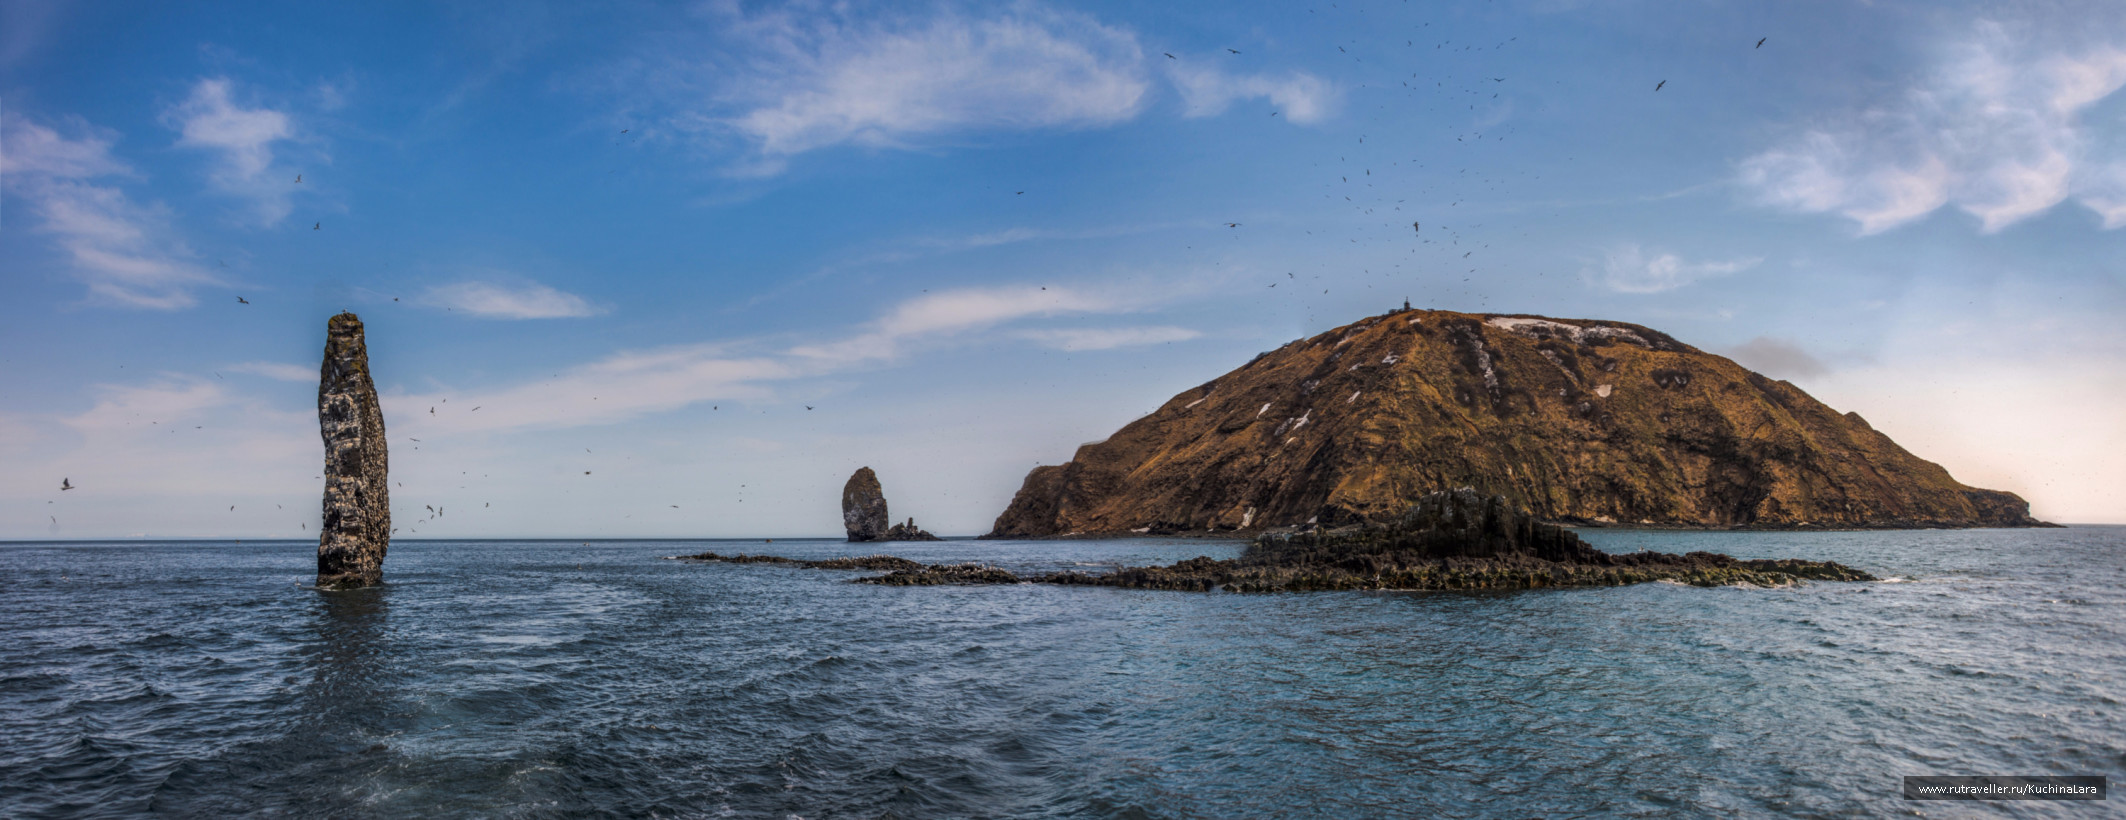 ��������_2016-1306 Panorama